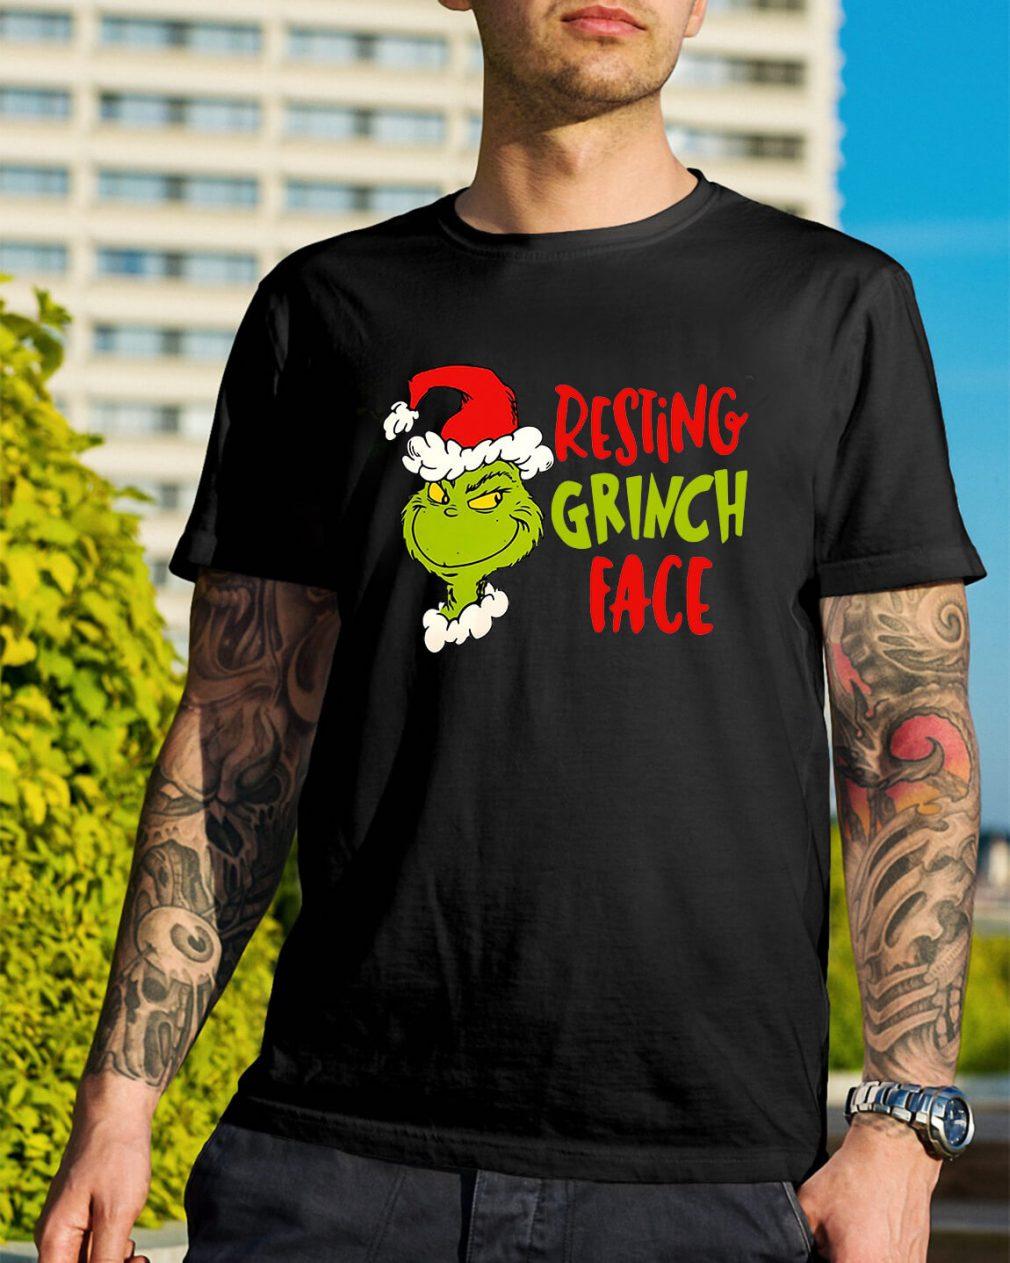 Dr Seuss Primark resting grinch face shirt